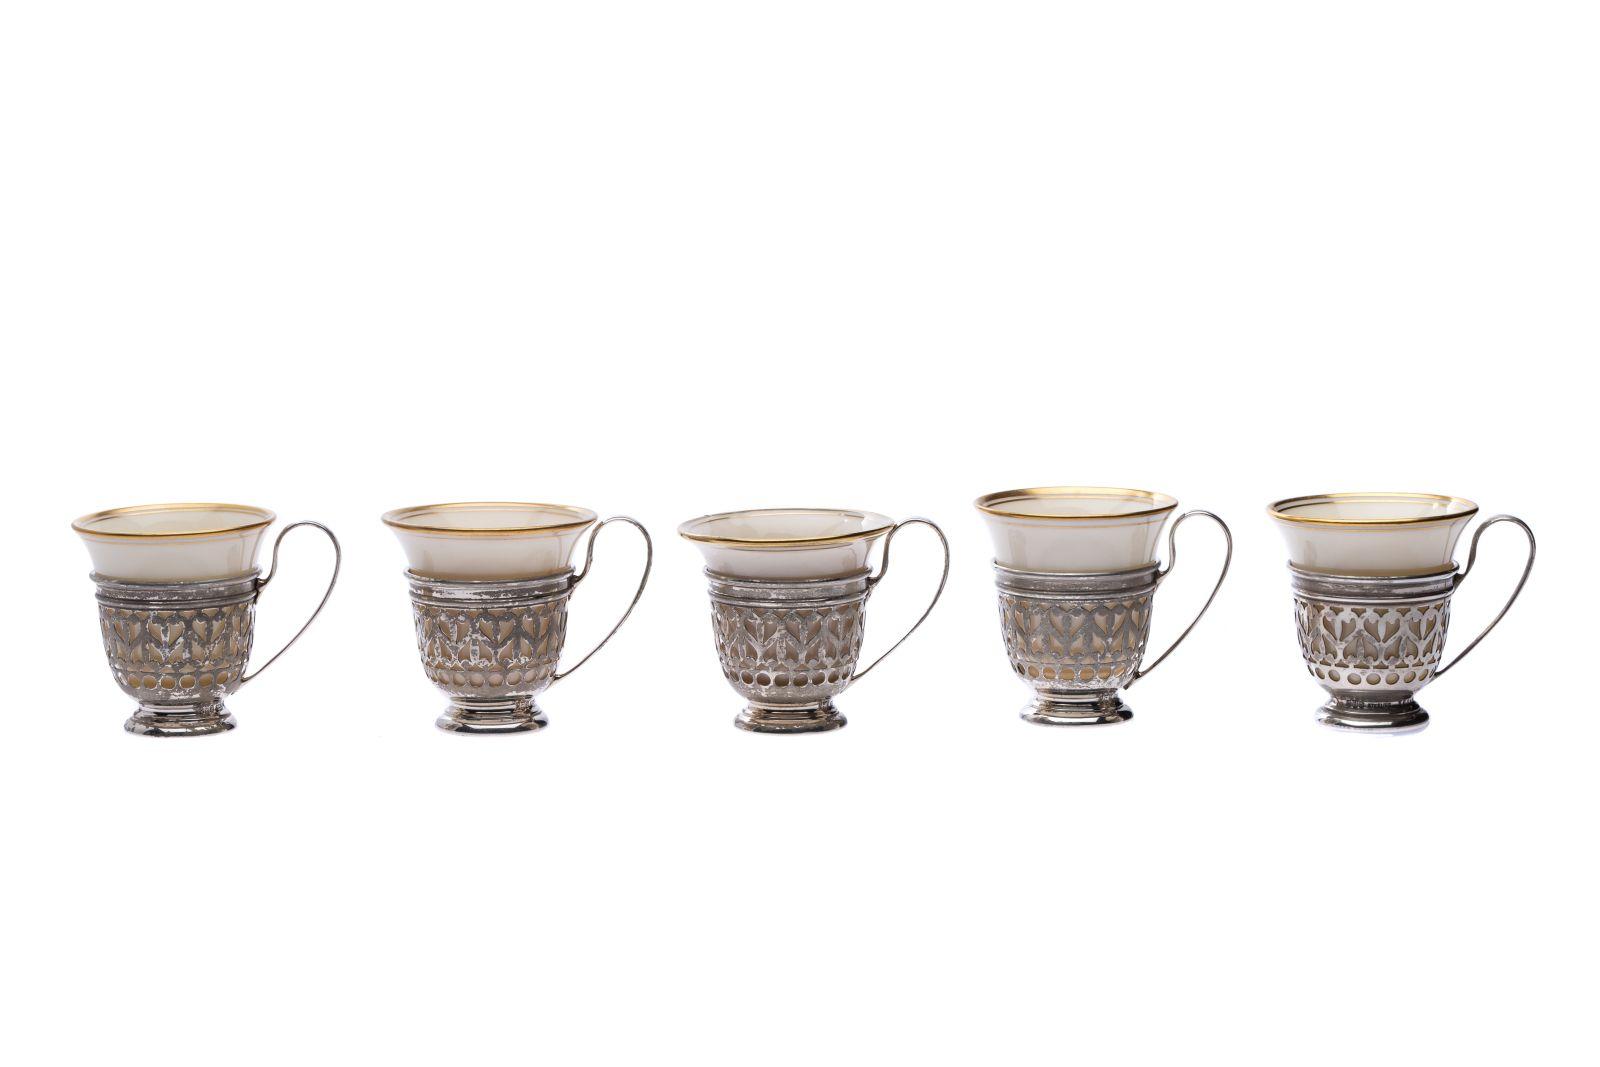 #22 5 silver cups | 5 Silbertassen Image